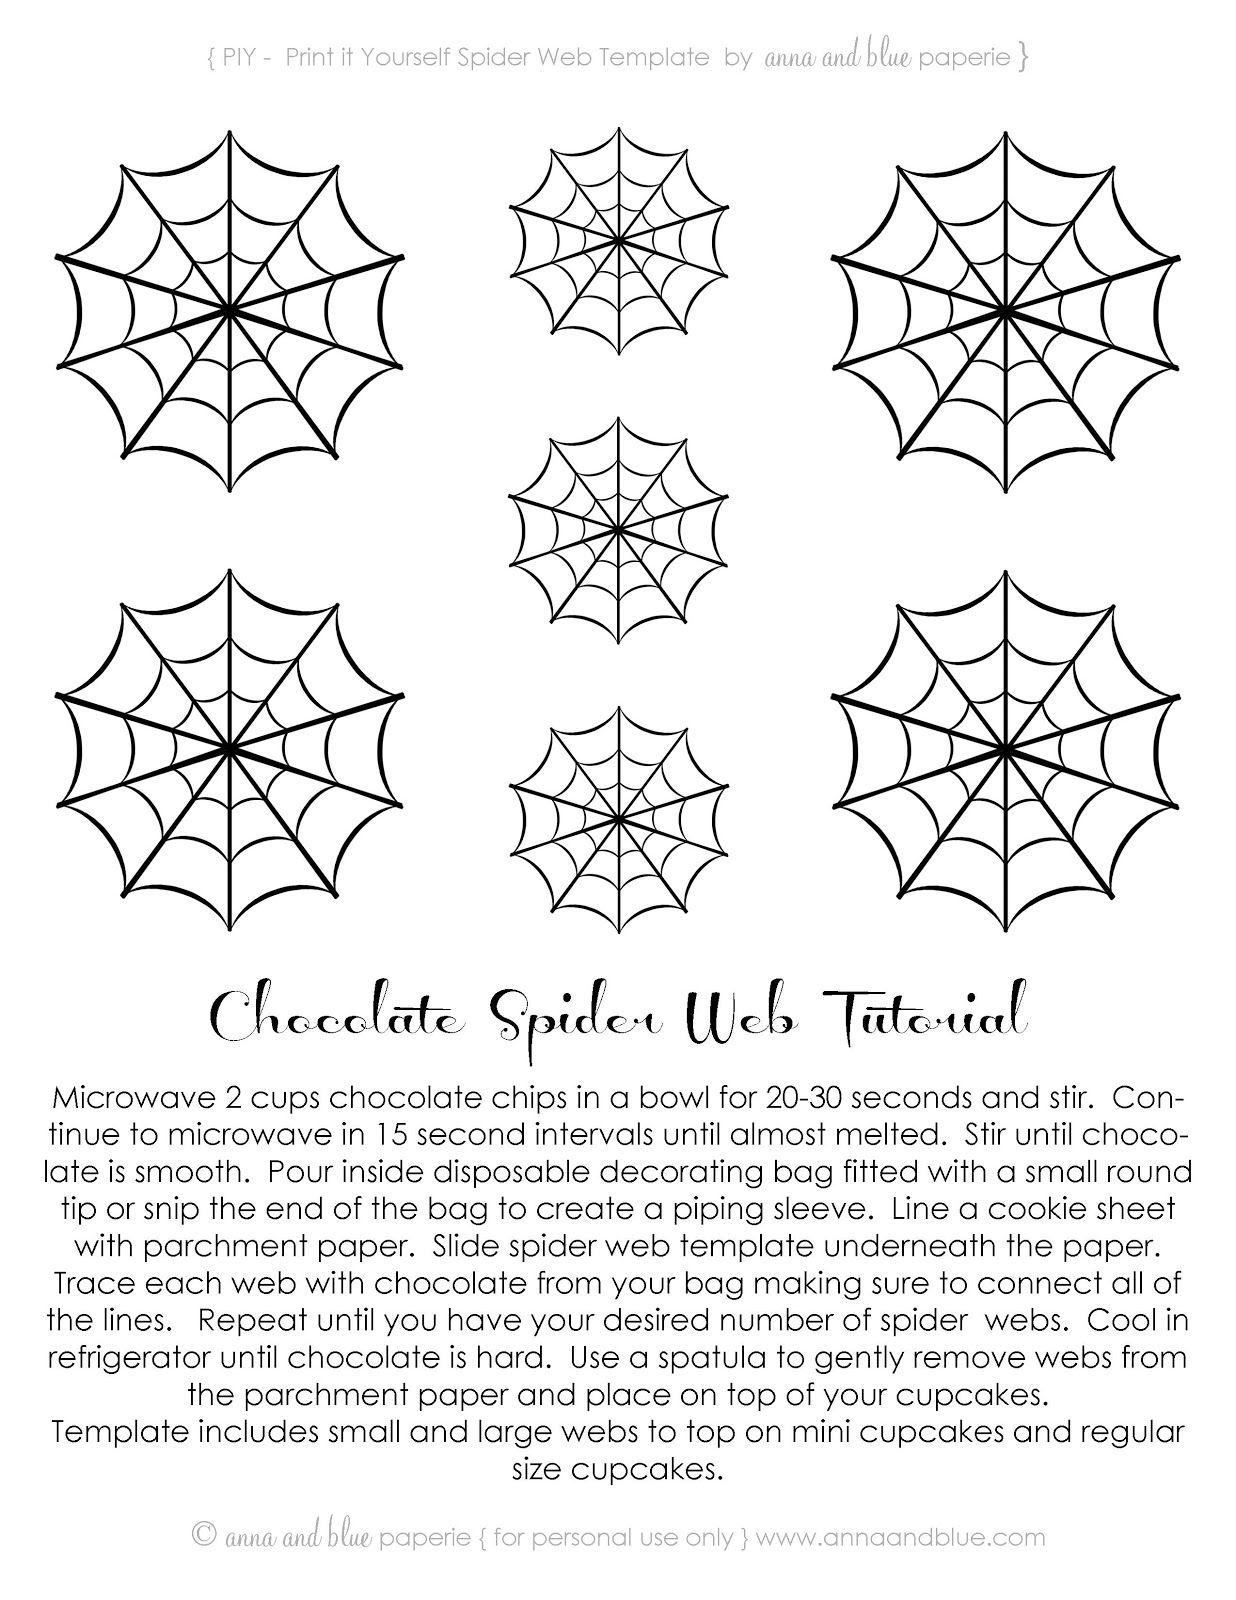 Free Printable Chocolate Spider Web Tutorial